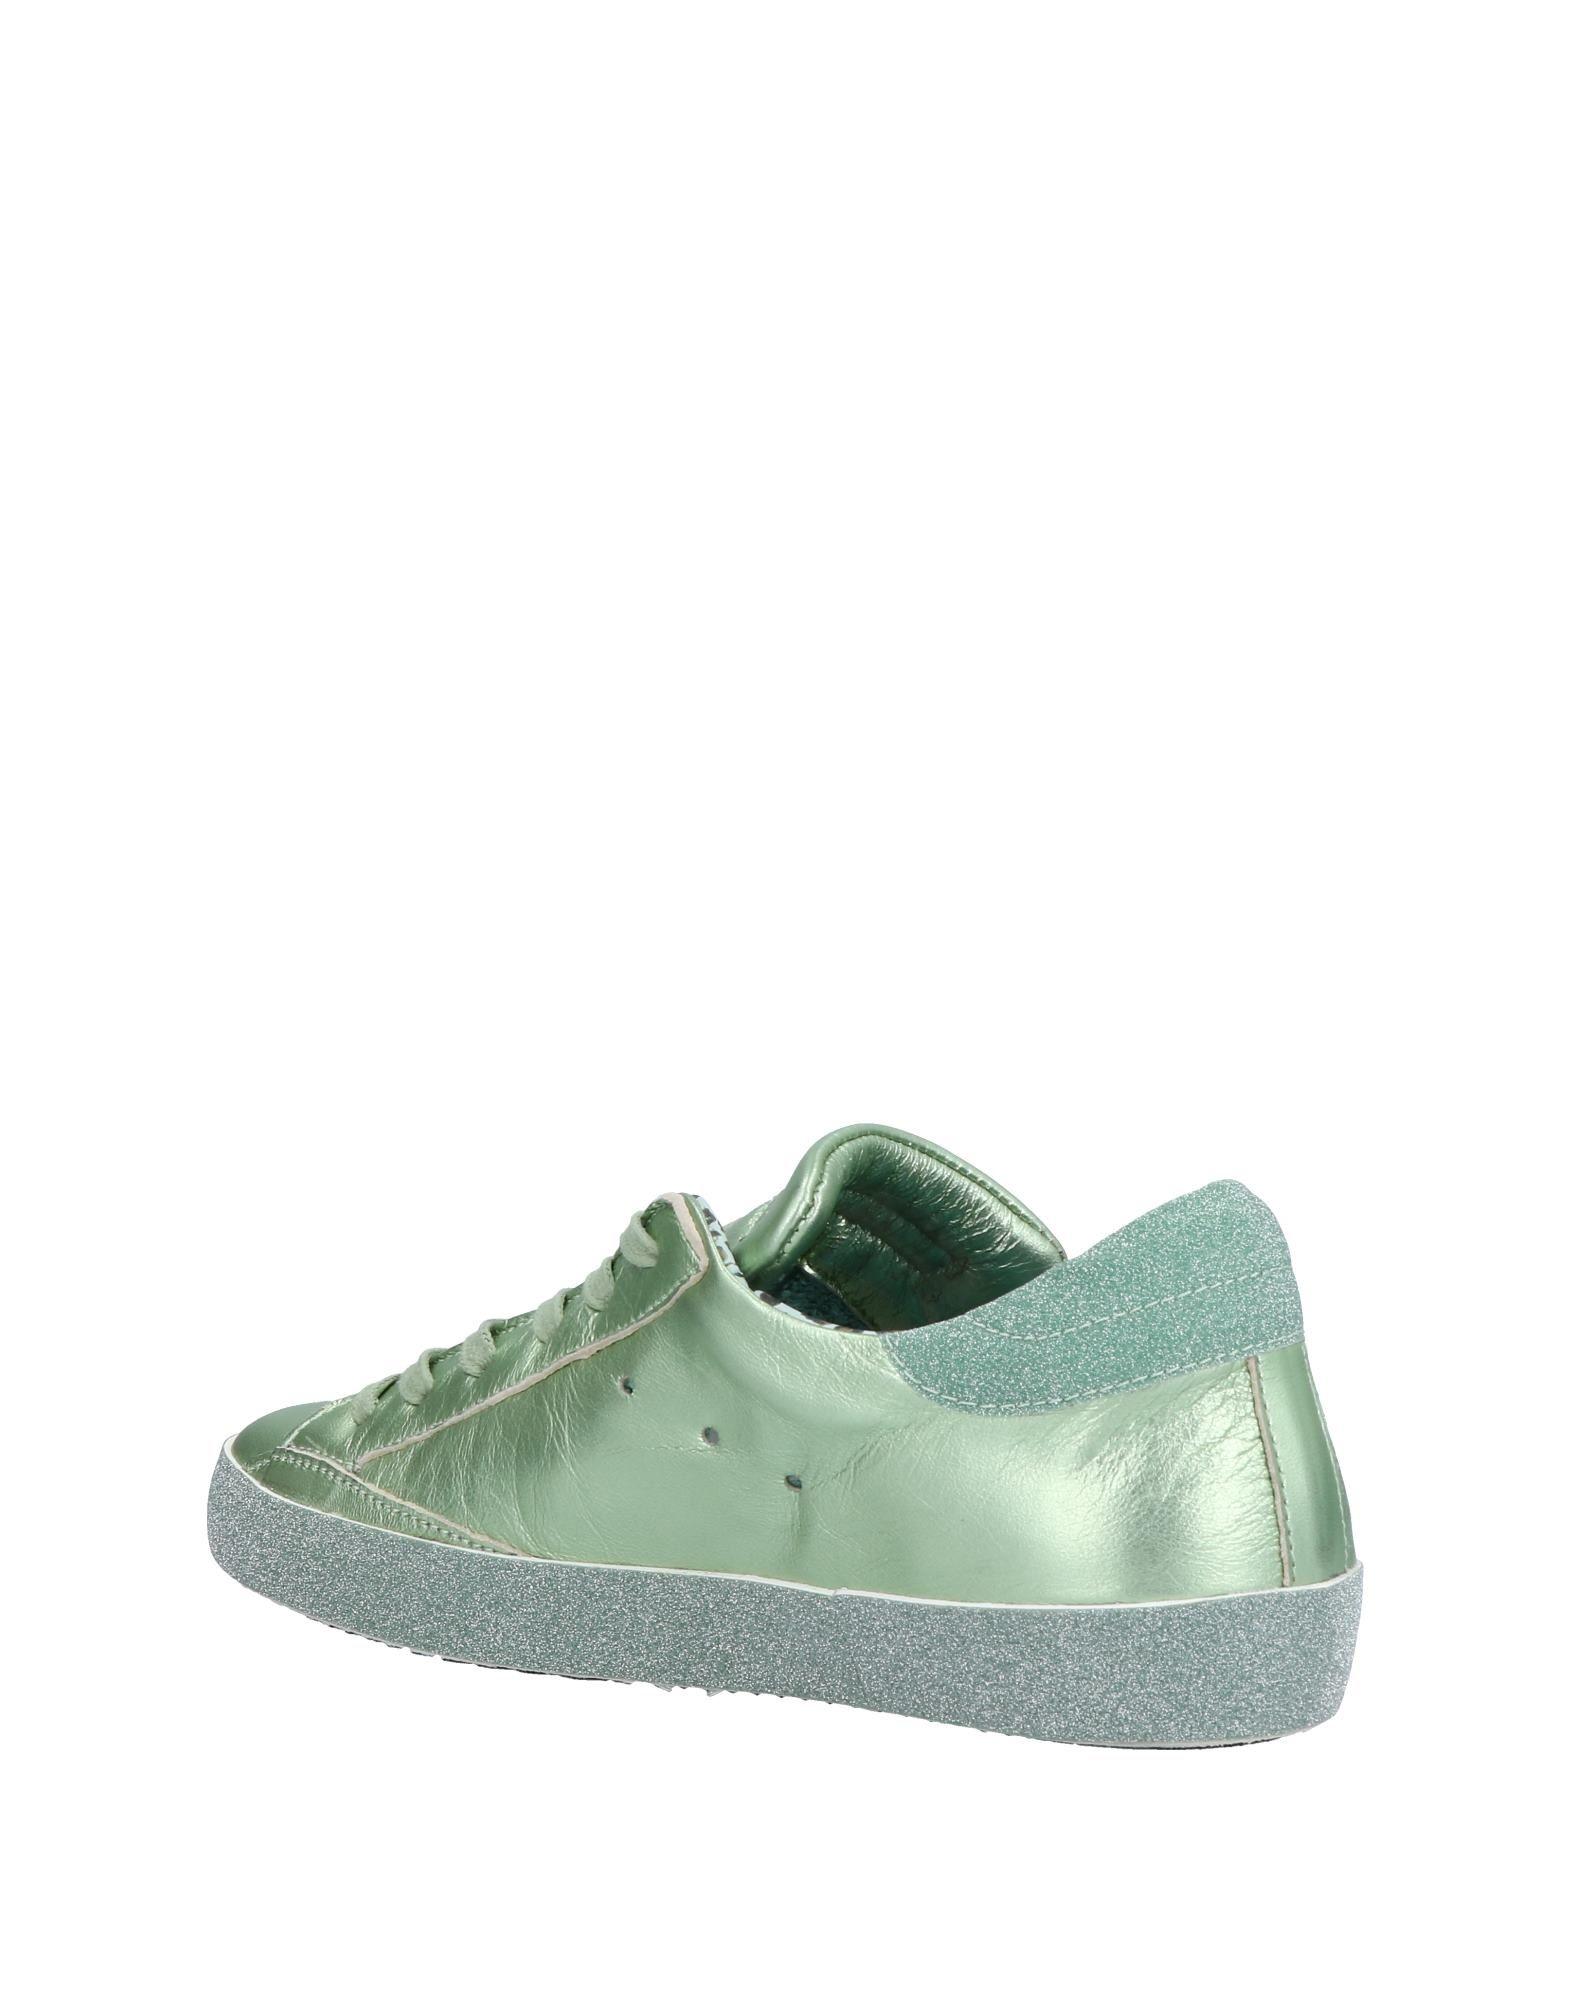 Stilvolle billige Sneakers Schuhe Philippe Model Sneakers billige Damen  11495317QX 72c65d